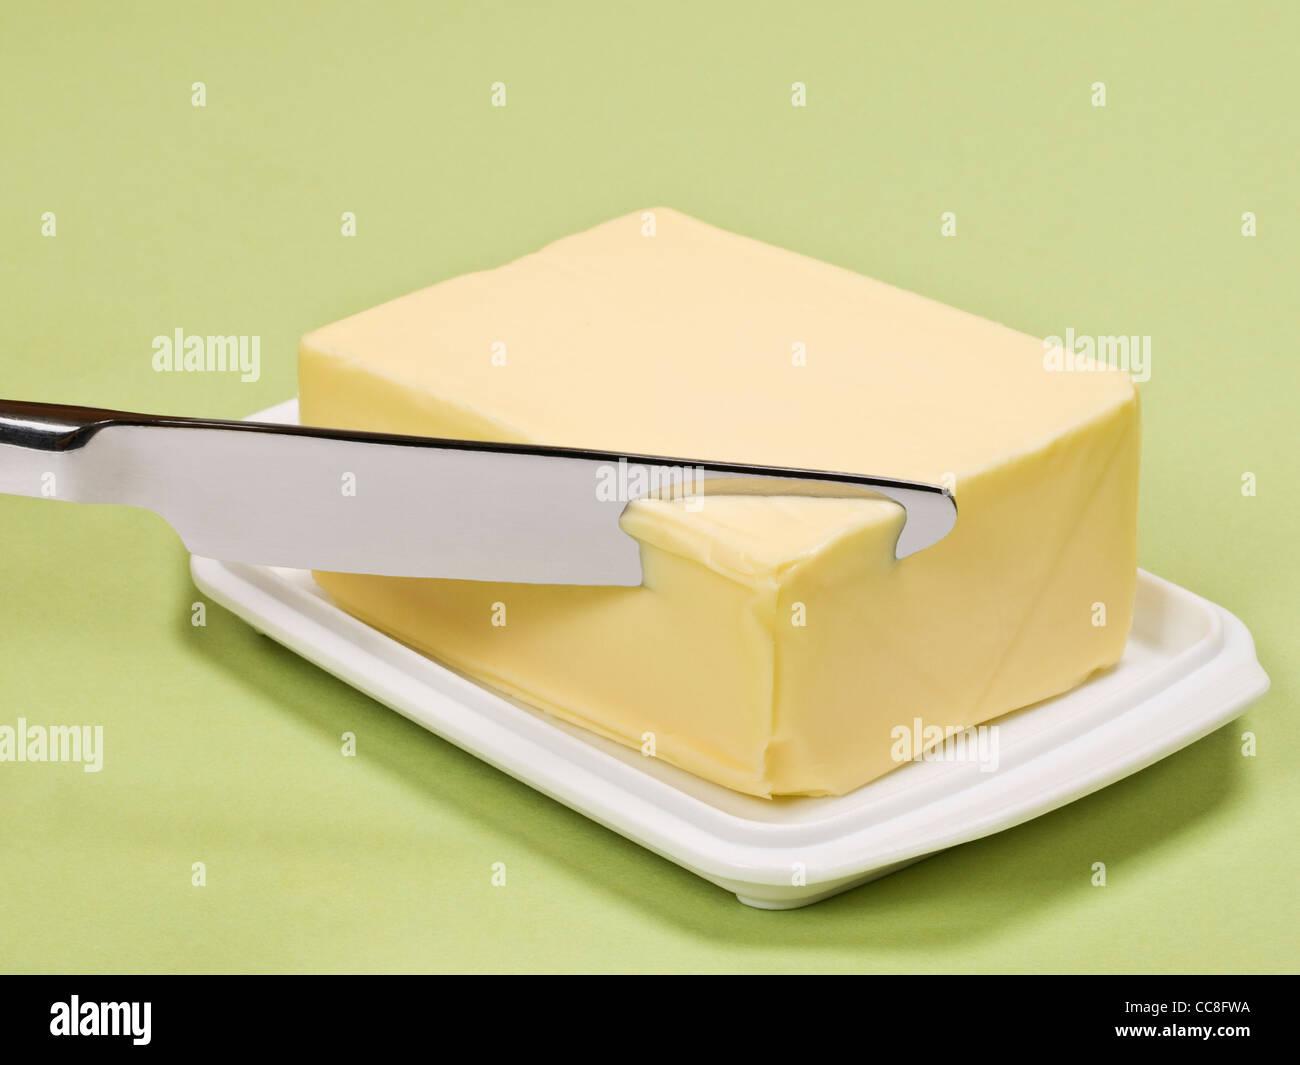 Ein Stück burro wird angeschnitten | un pezzo di burro è tagliata a fette Immagini Stock